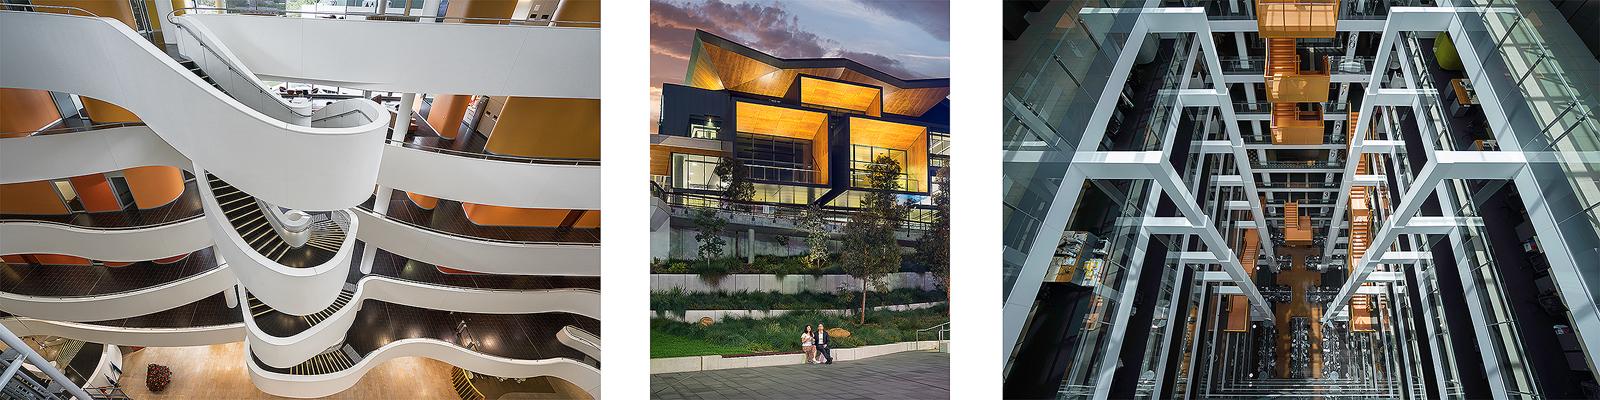 Architecture-photographic-services-sydney-australia-luke-zeme